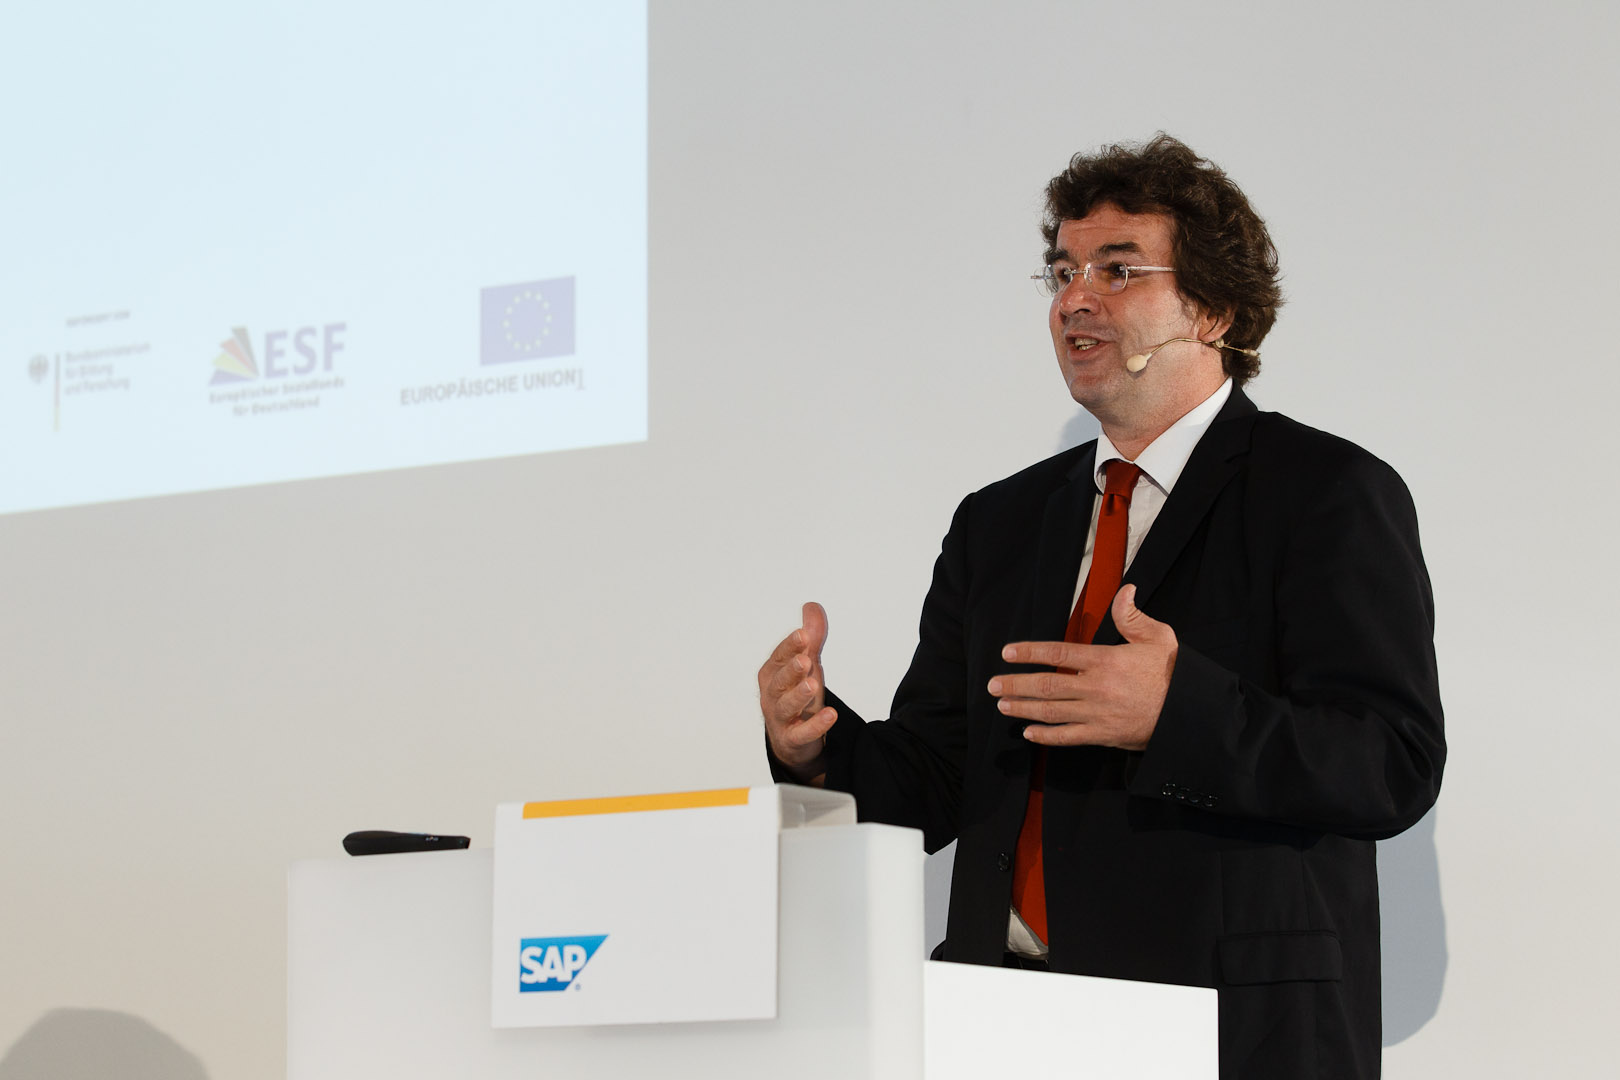 Prof. Dr. Rainer Trinczek